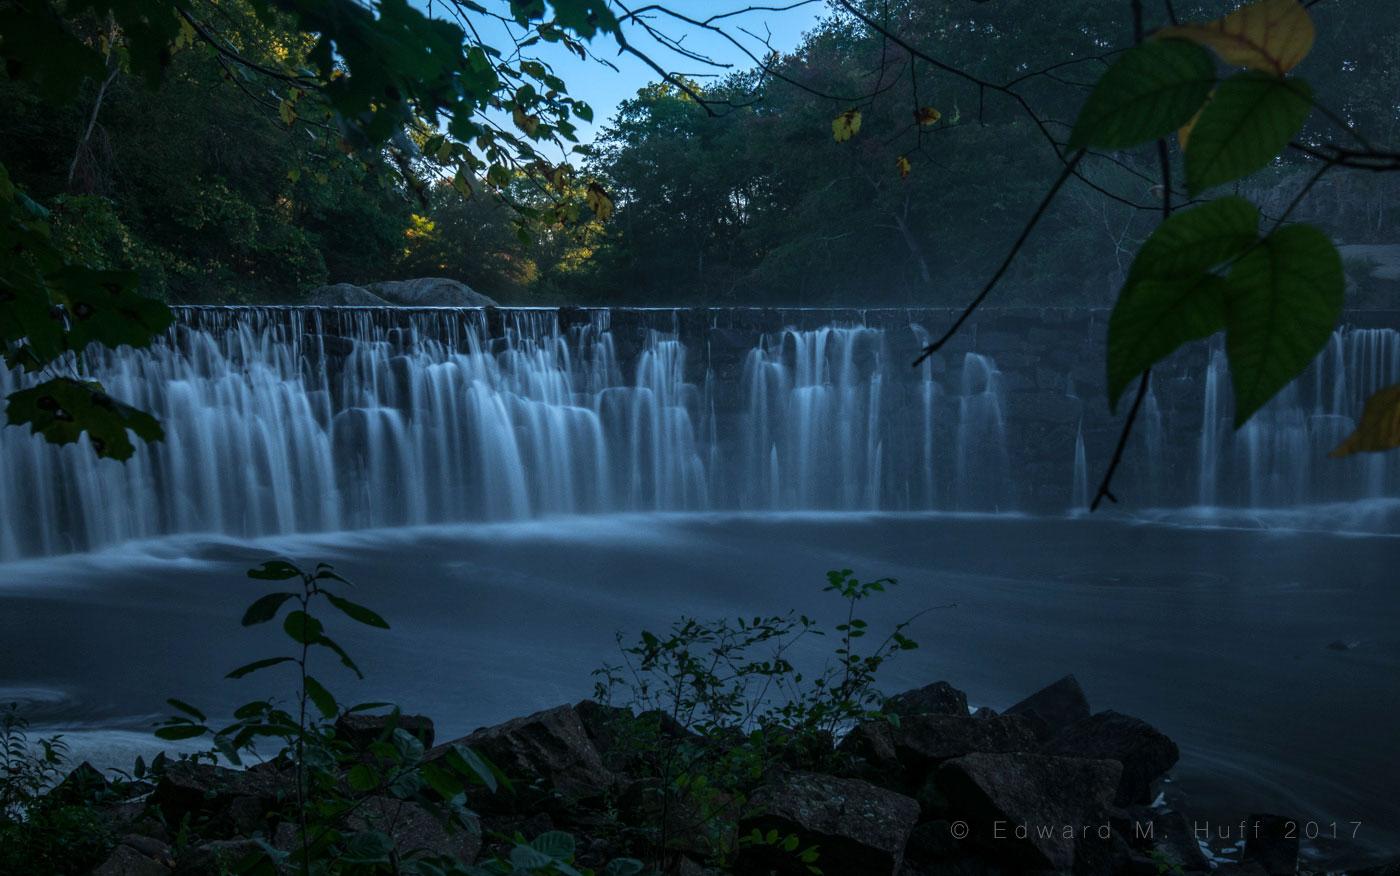 Old Stone Dam, Hope Valley, Rhode Island